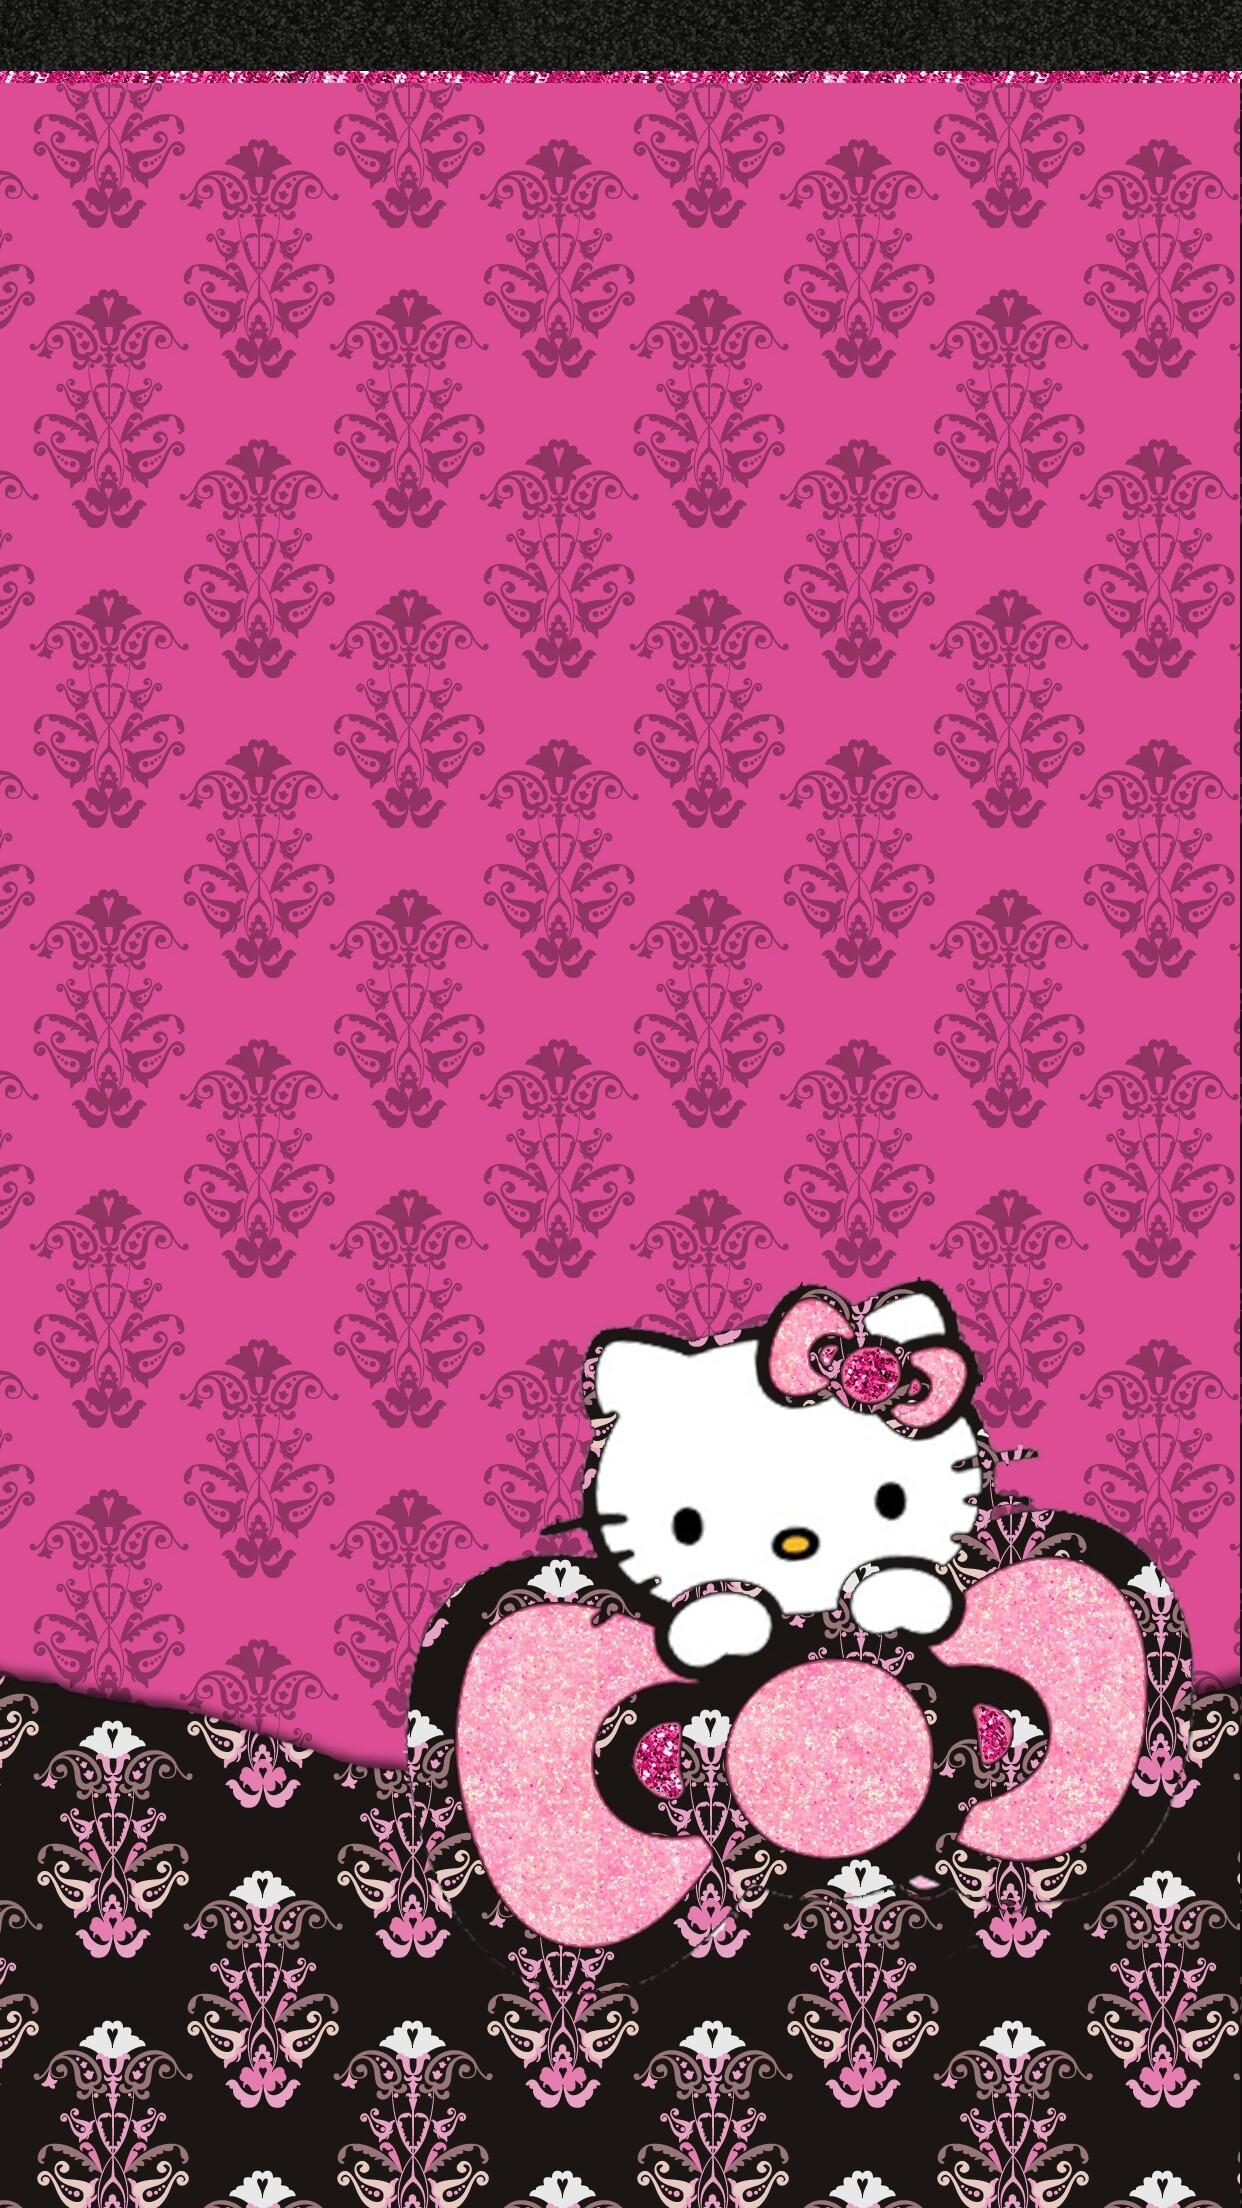 Simple Wallpaper Hello Kitty Punk - 836472-large-hello-kitty-wallpaper-1242x2208  2018_336550.jpg